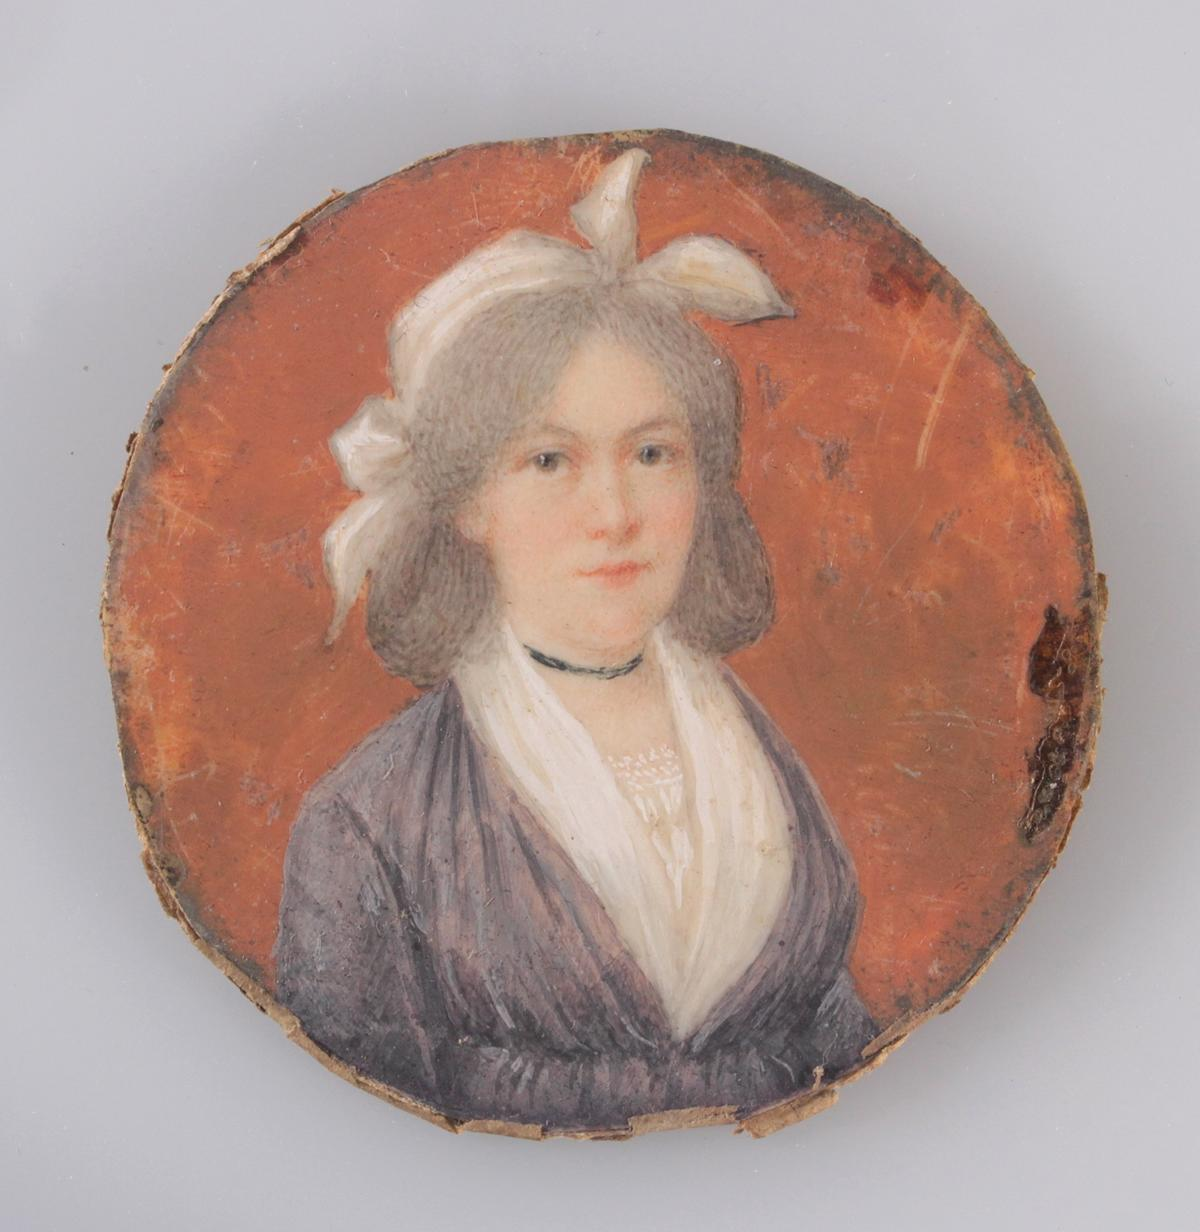 Biedermaier-Miniaturportrait, 1. Hälfte 19. Jh.-2